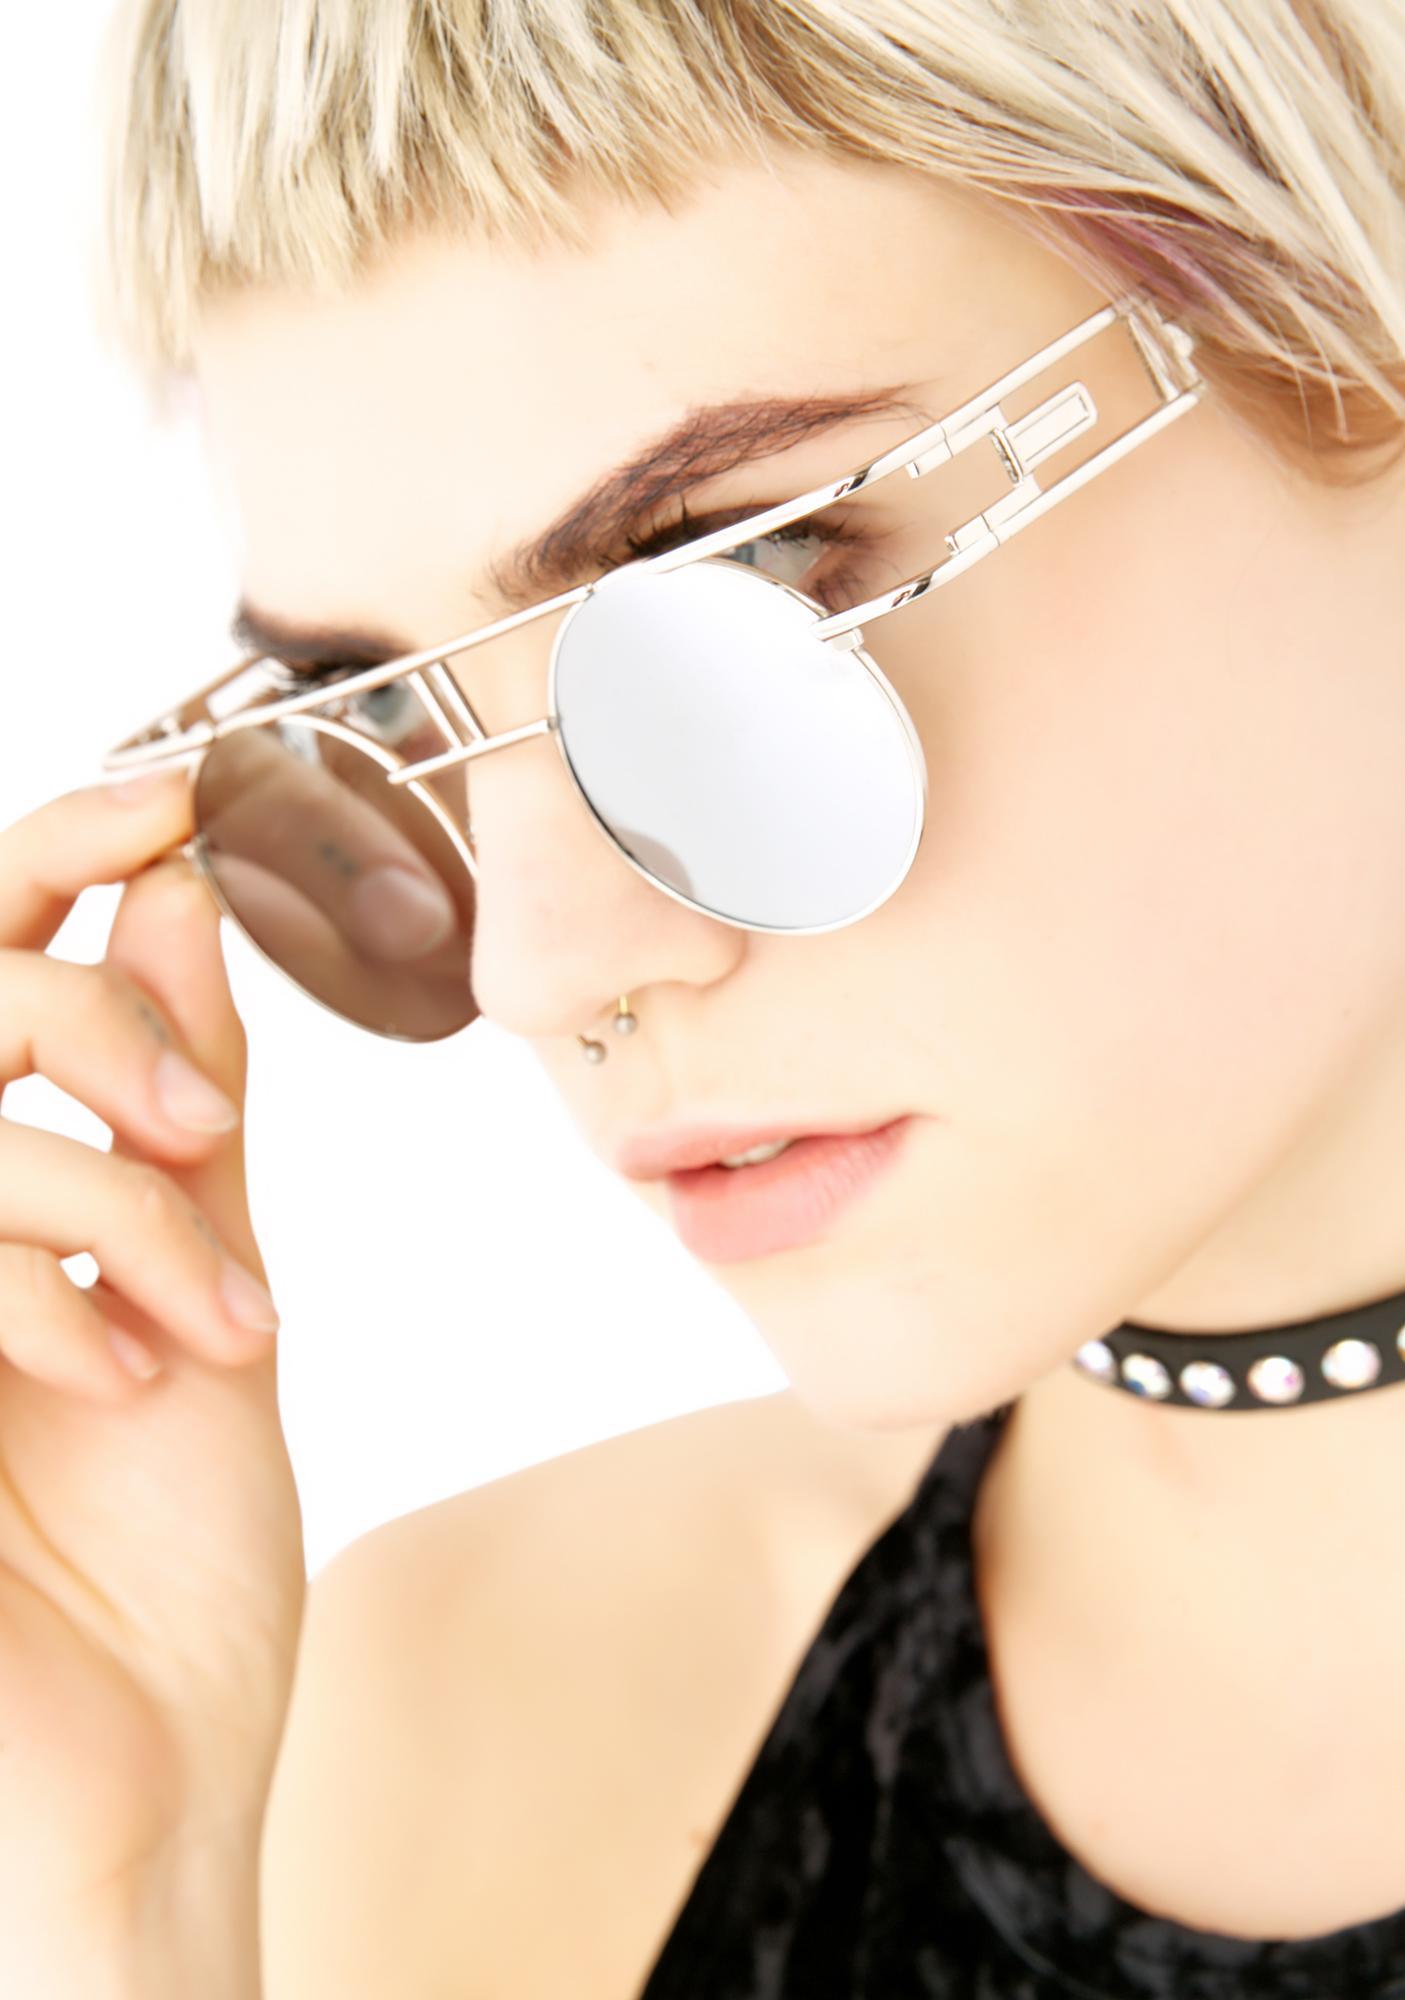 ESQAPE Speqz Onyx Sunglasses